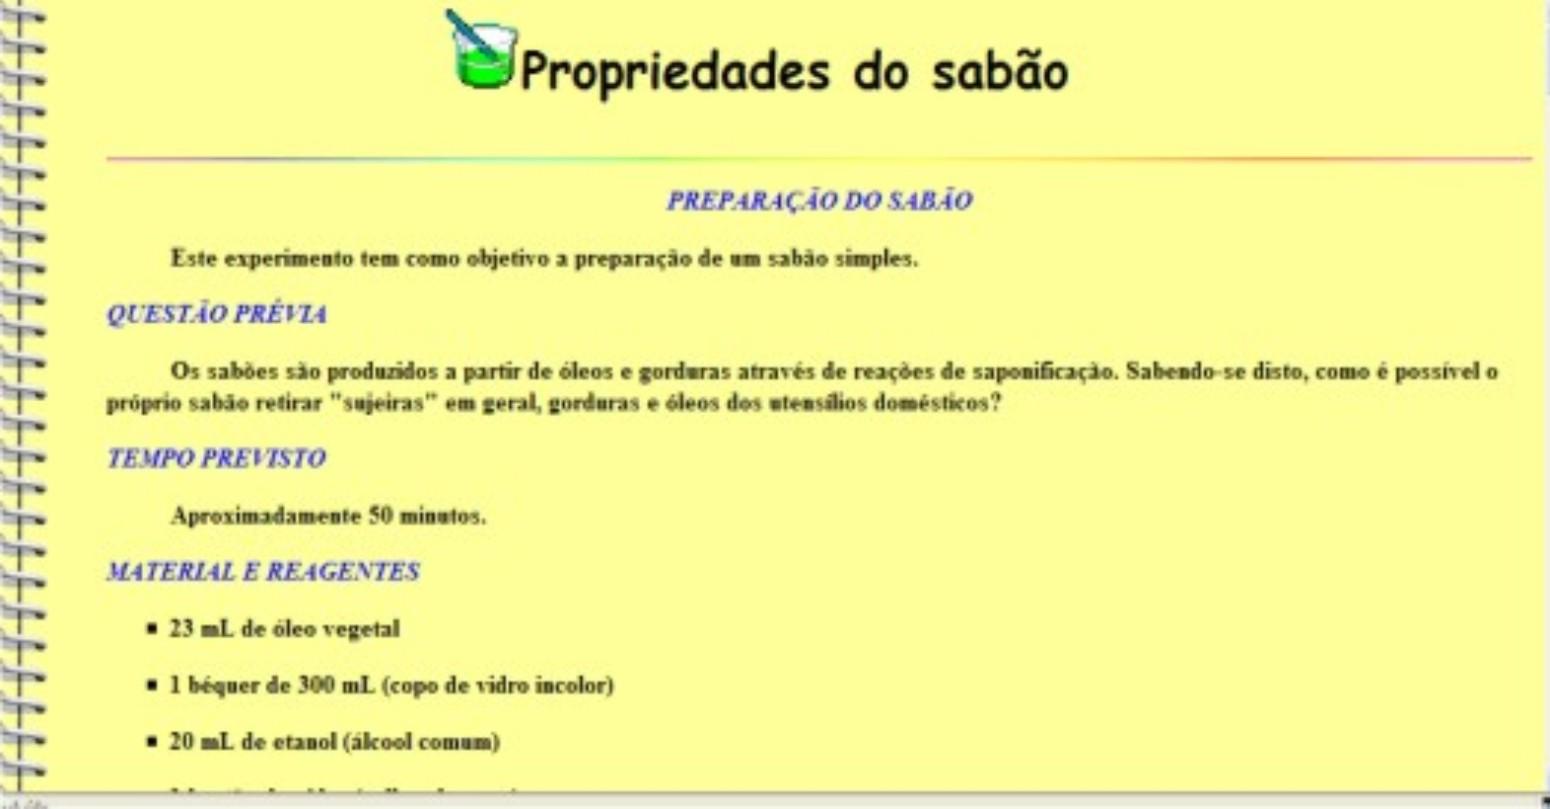 http://portaldoprofessor.mec.gov.br/storage/discovirtual/aulas/527/imagens/sabaooo.jpg